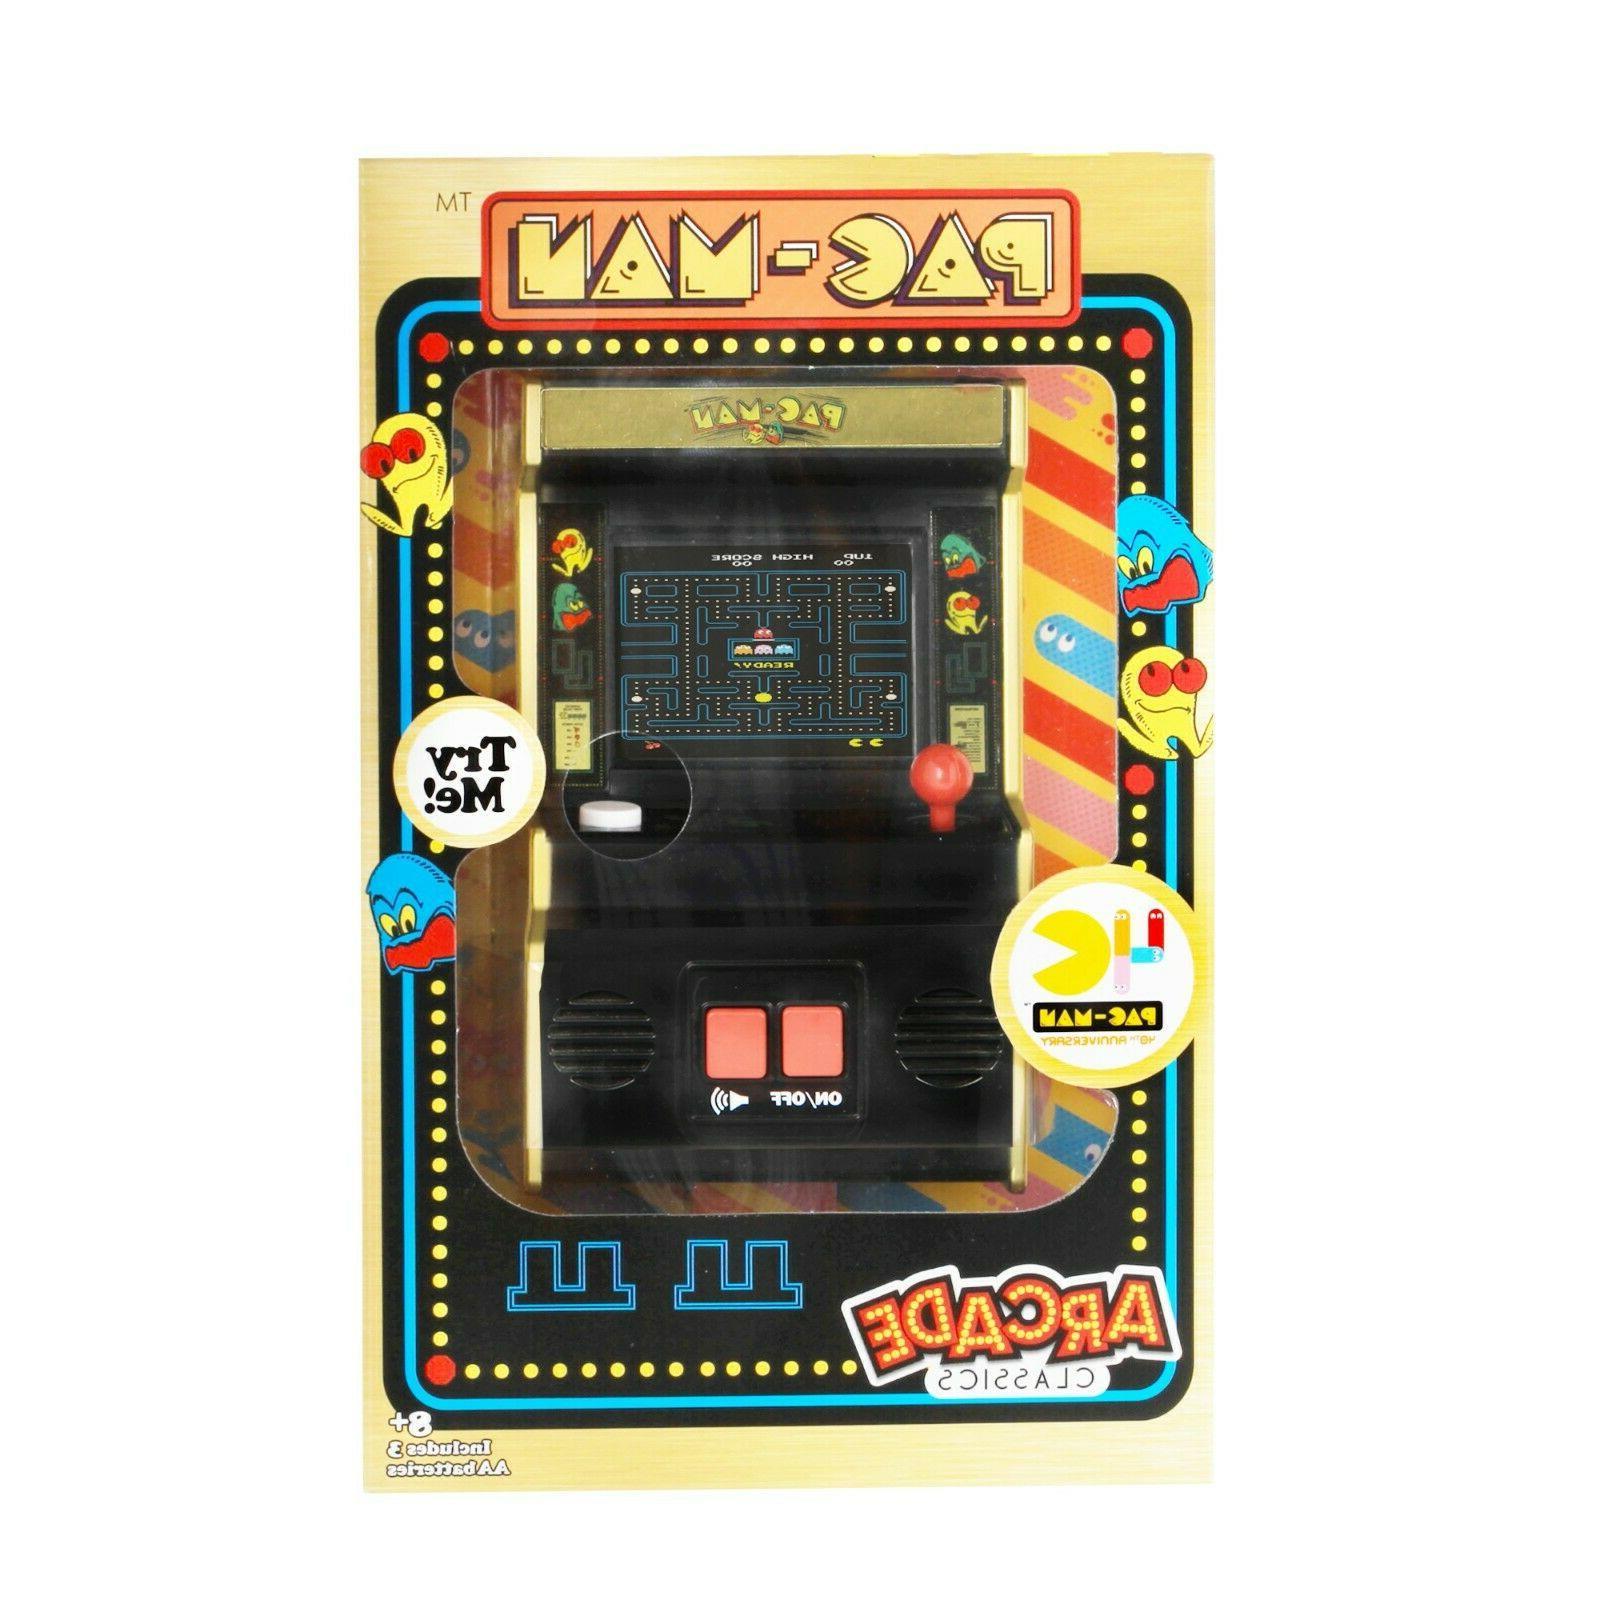 Arcade Classics 40th Aniversary Retro Arcade - Gold Edition